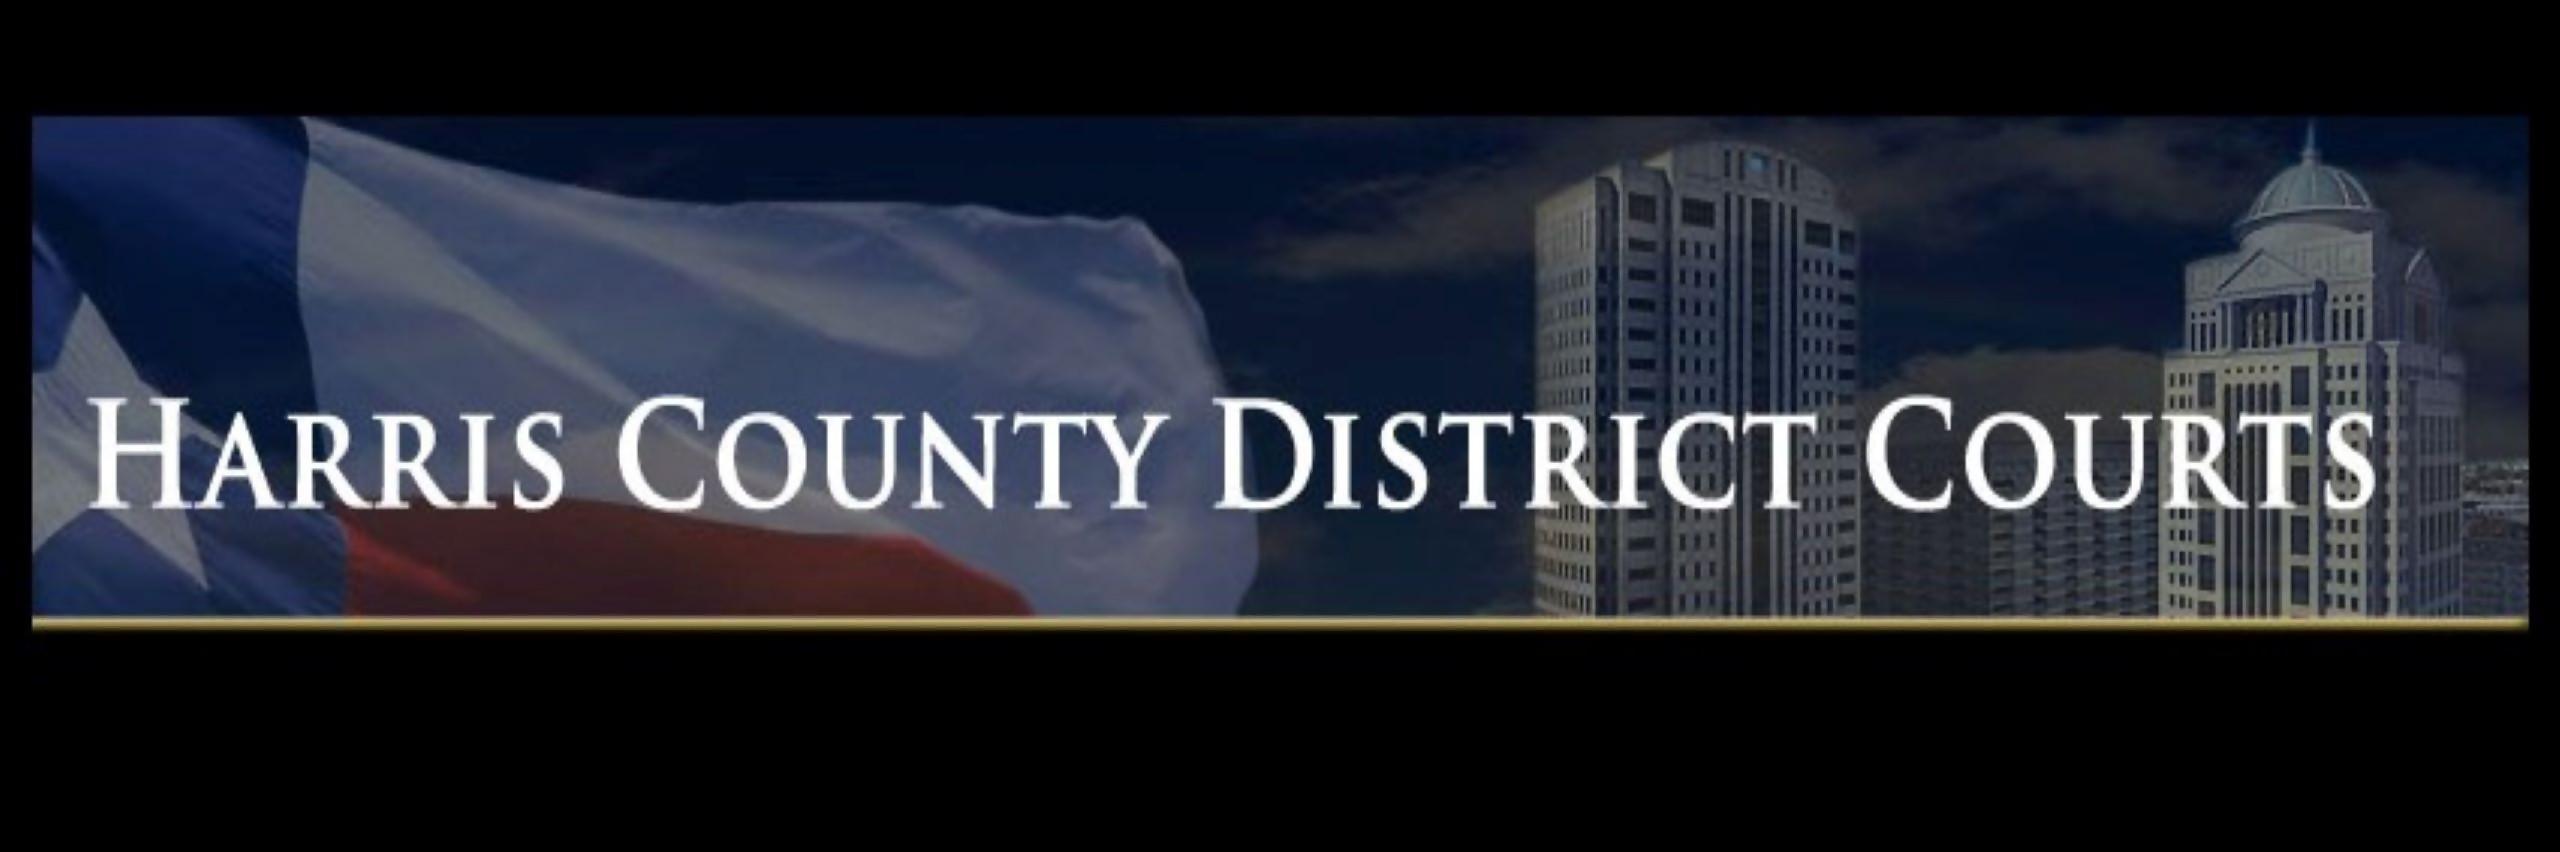 310th District Court AJ - Live Stream